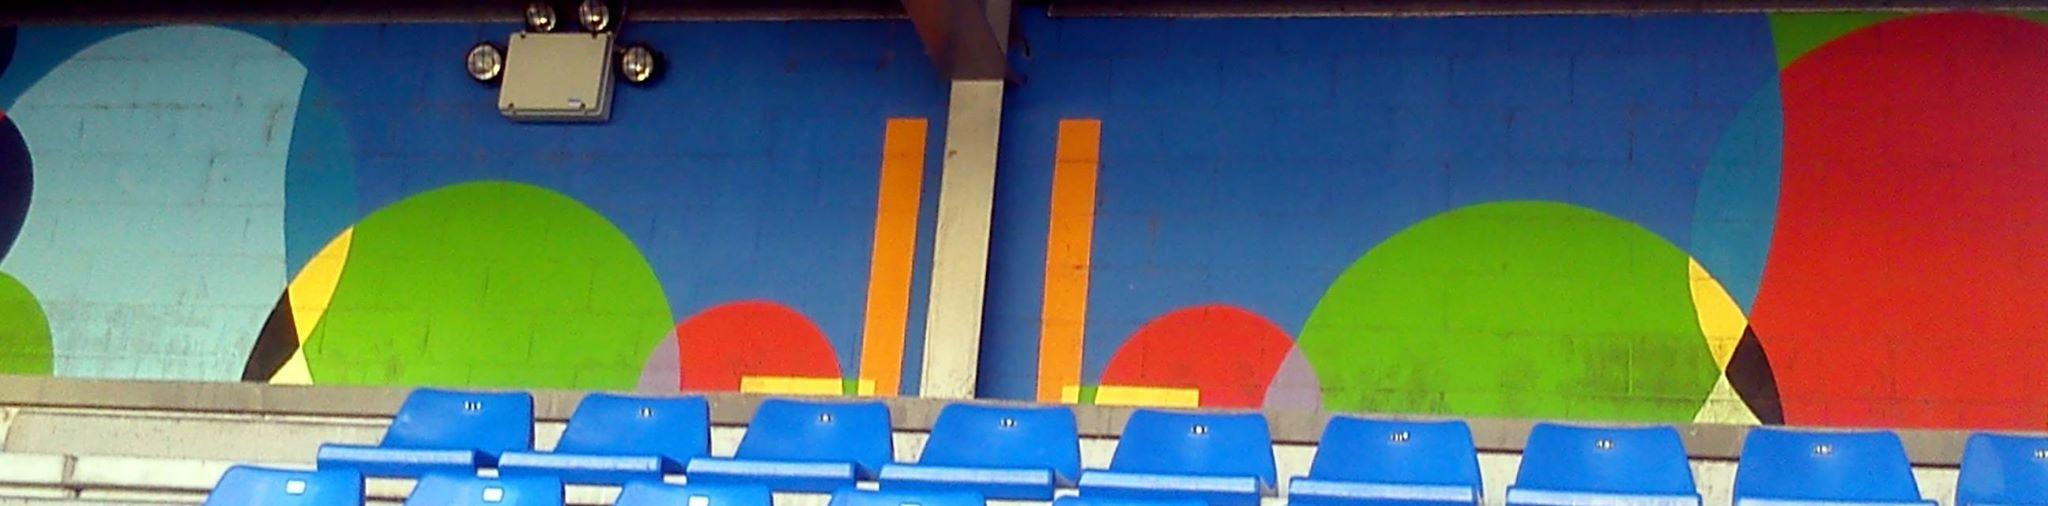 Pintura mural estadio municipal Ganzábal obra de José Sánchez Prieto La Felguera Langreo